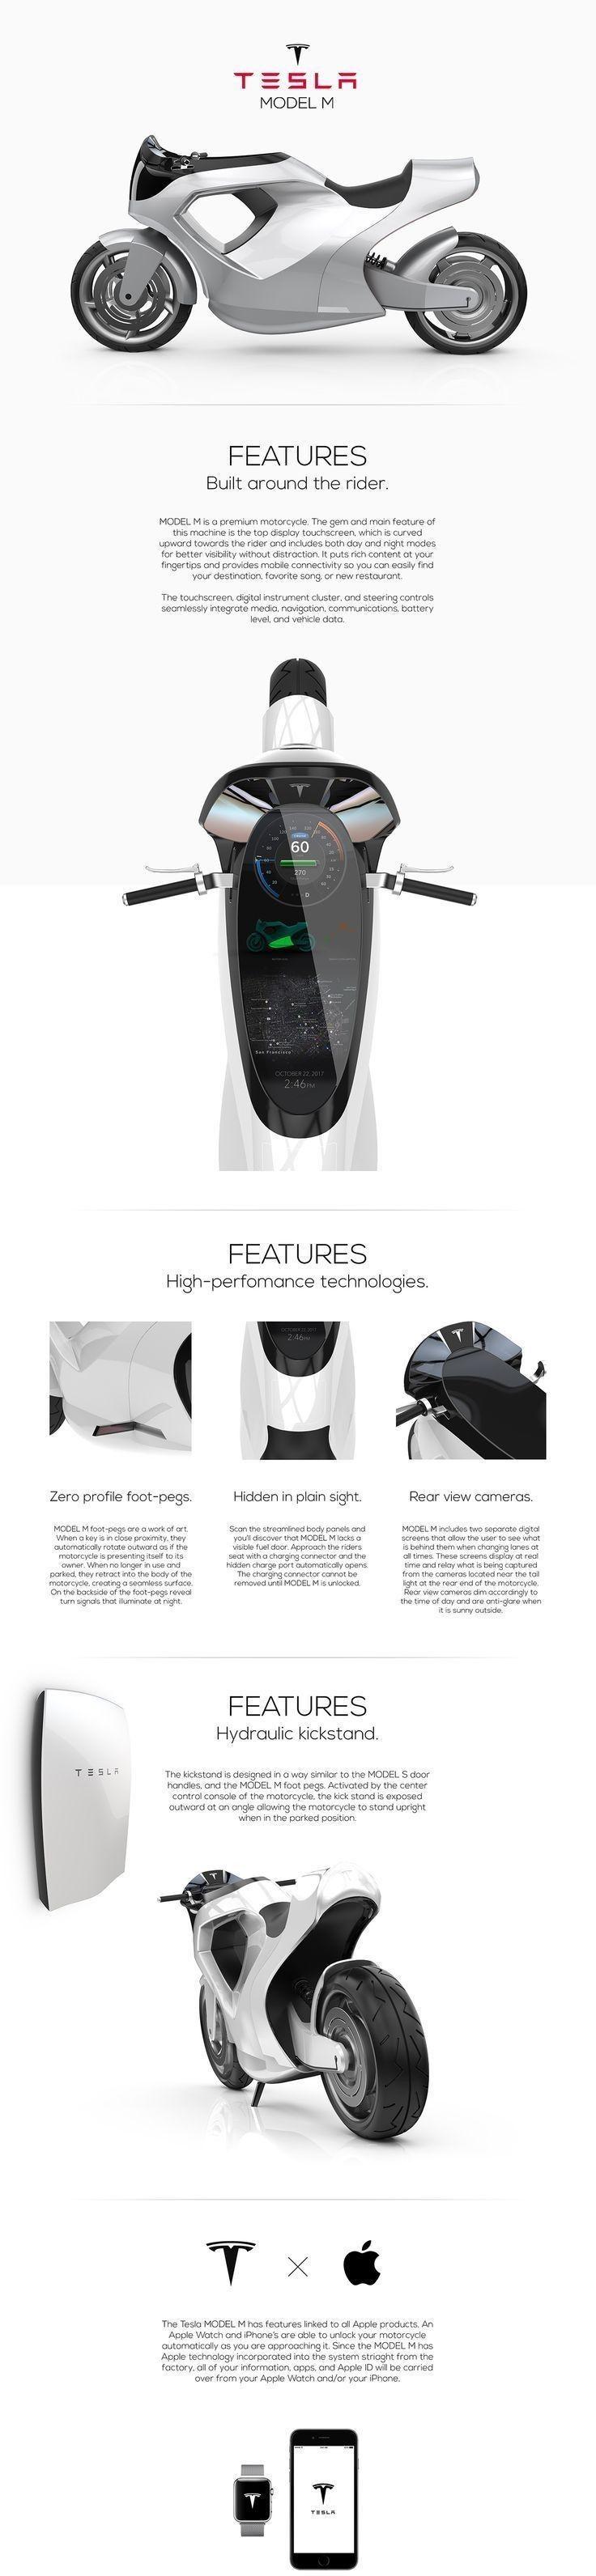 Tesla Emotors Tesla car, Electric motorcycle